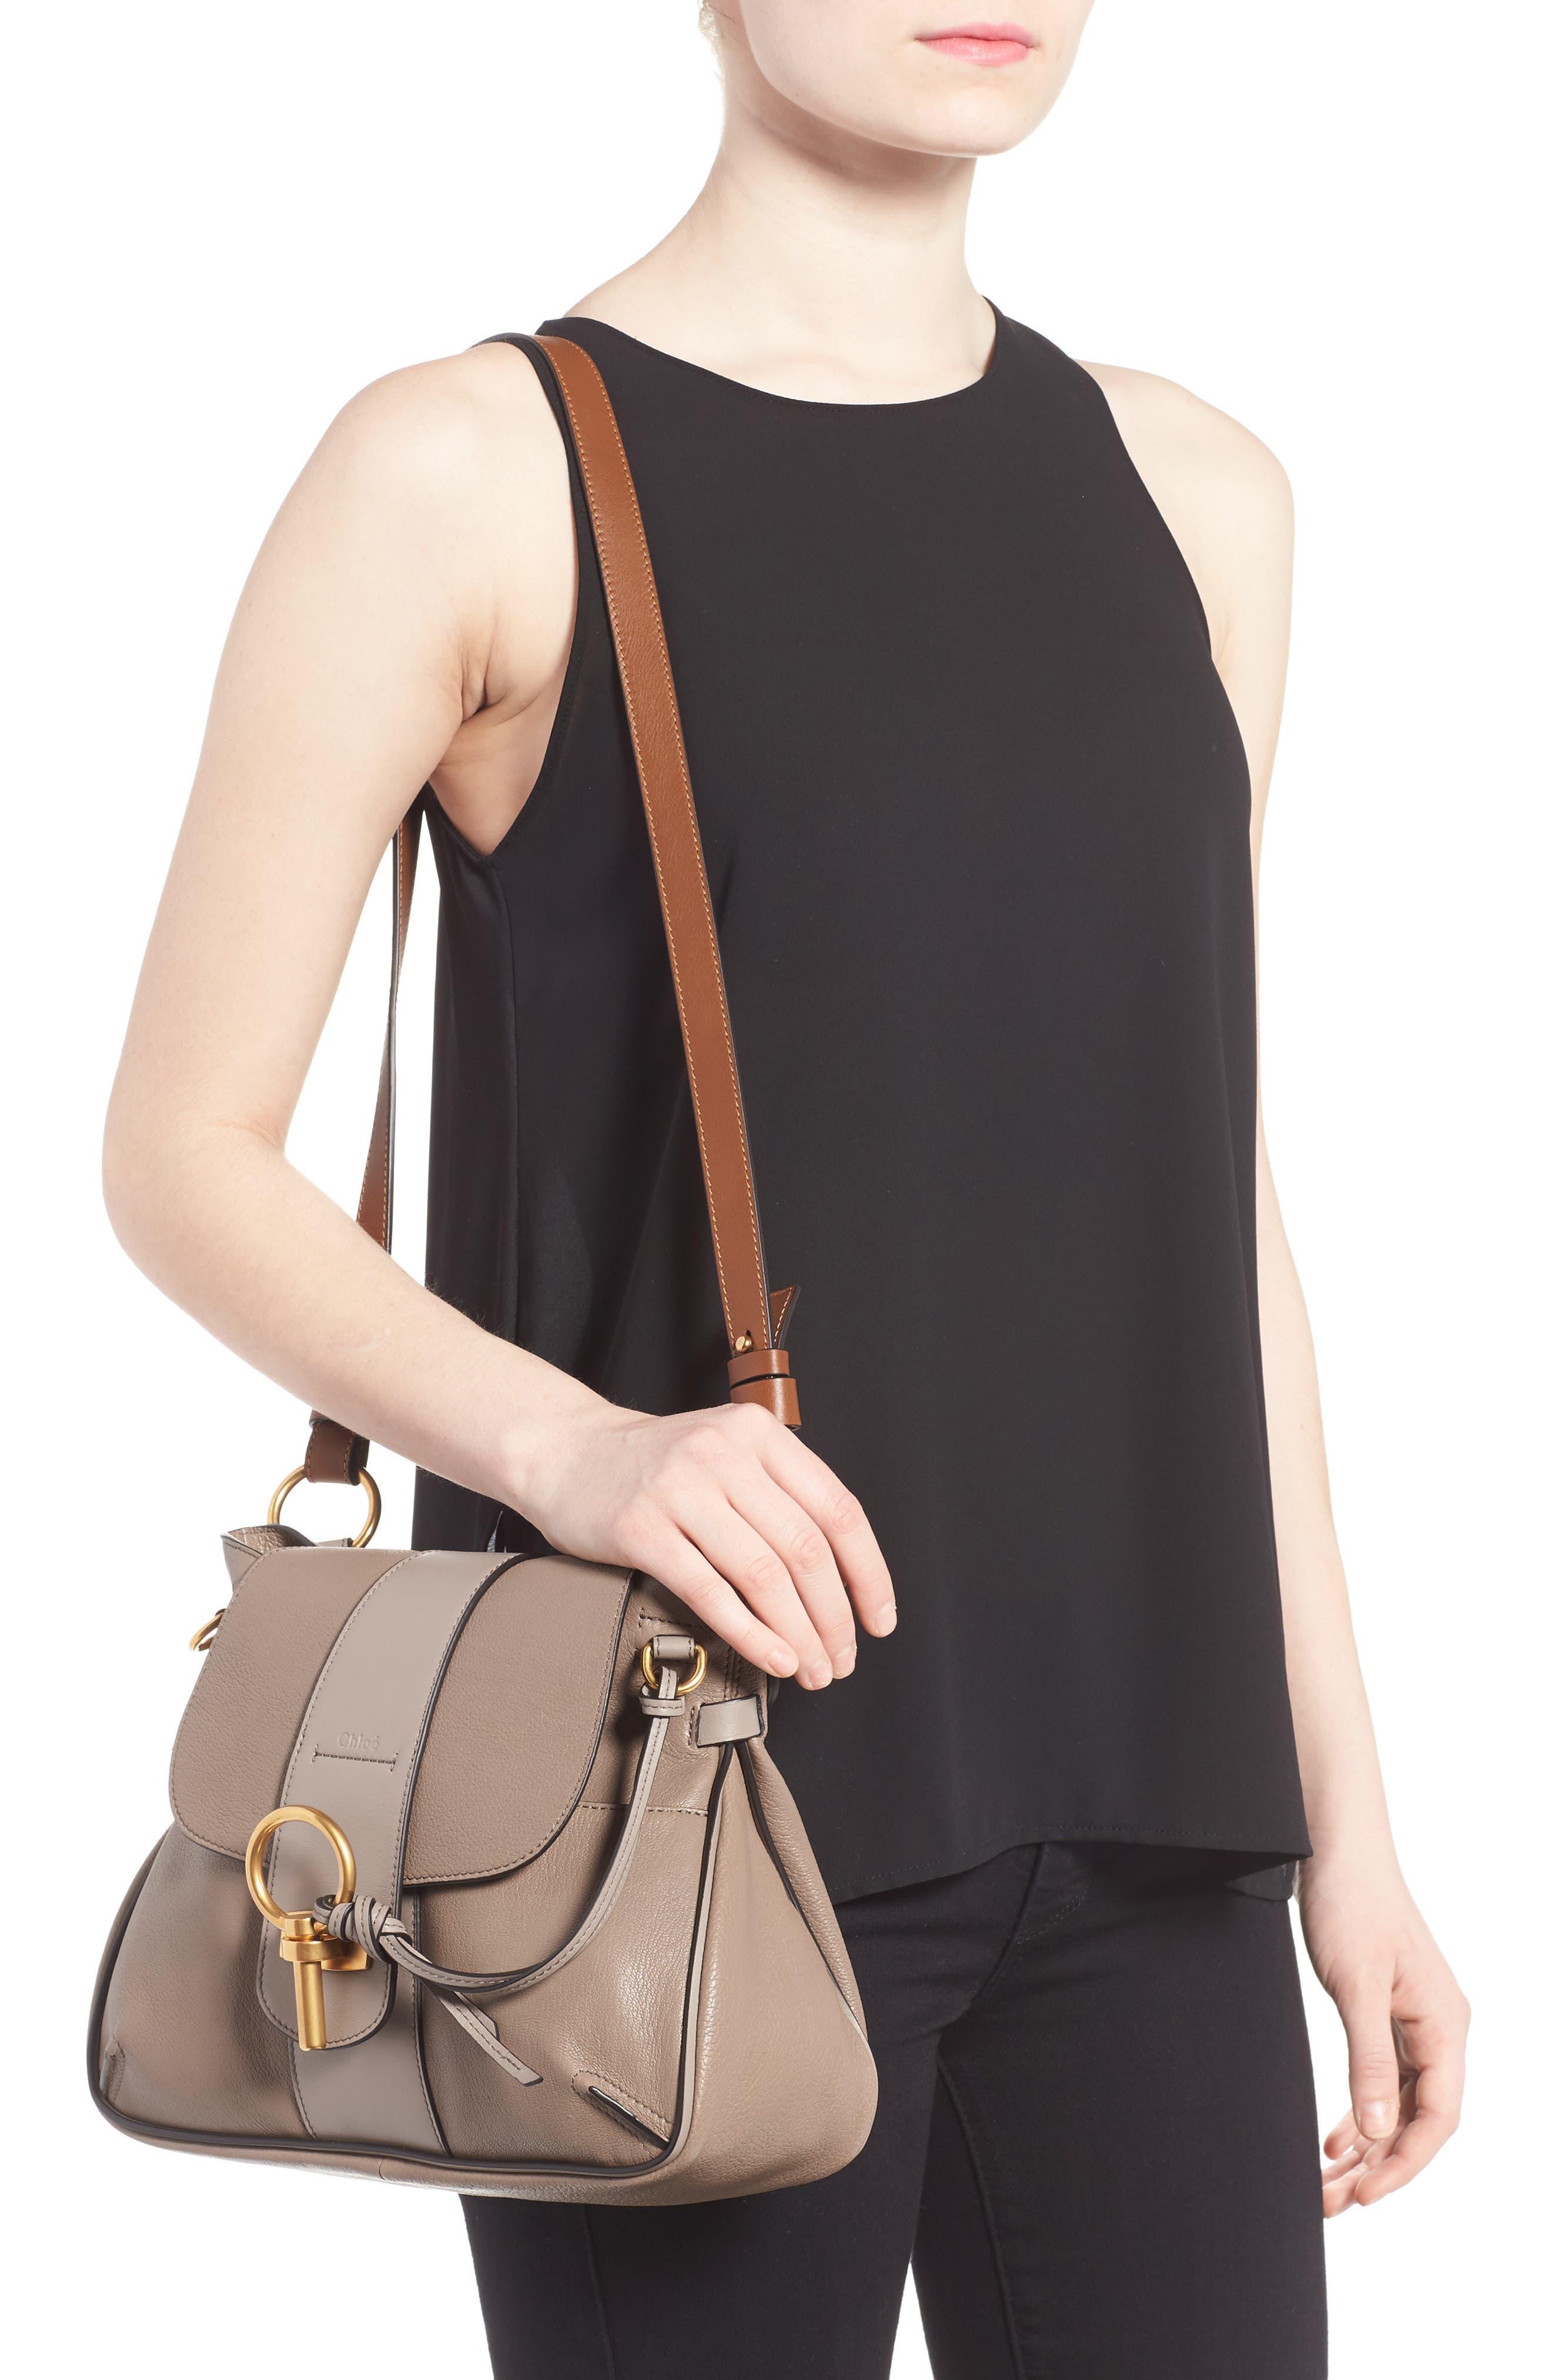 CHLOÉ,                             Small Lexa Leather Shoulder Bag,                             Alternate thumbnail 2, color,                             031